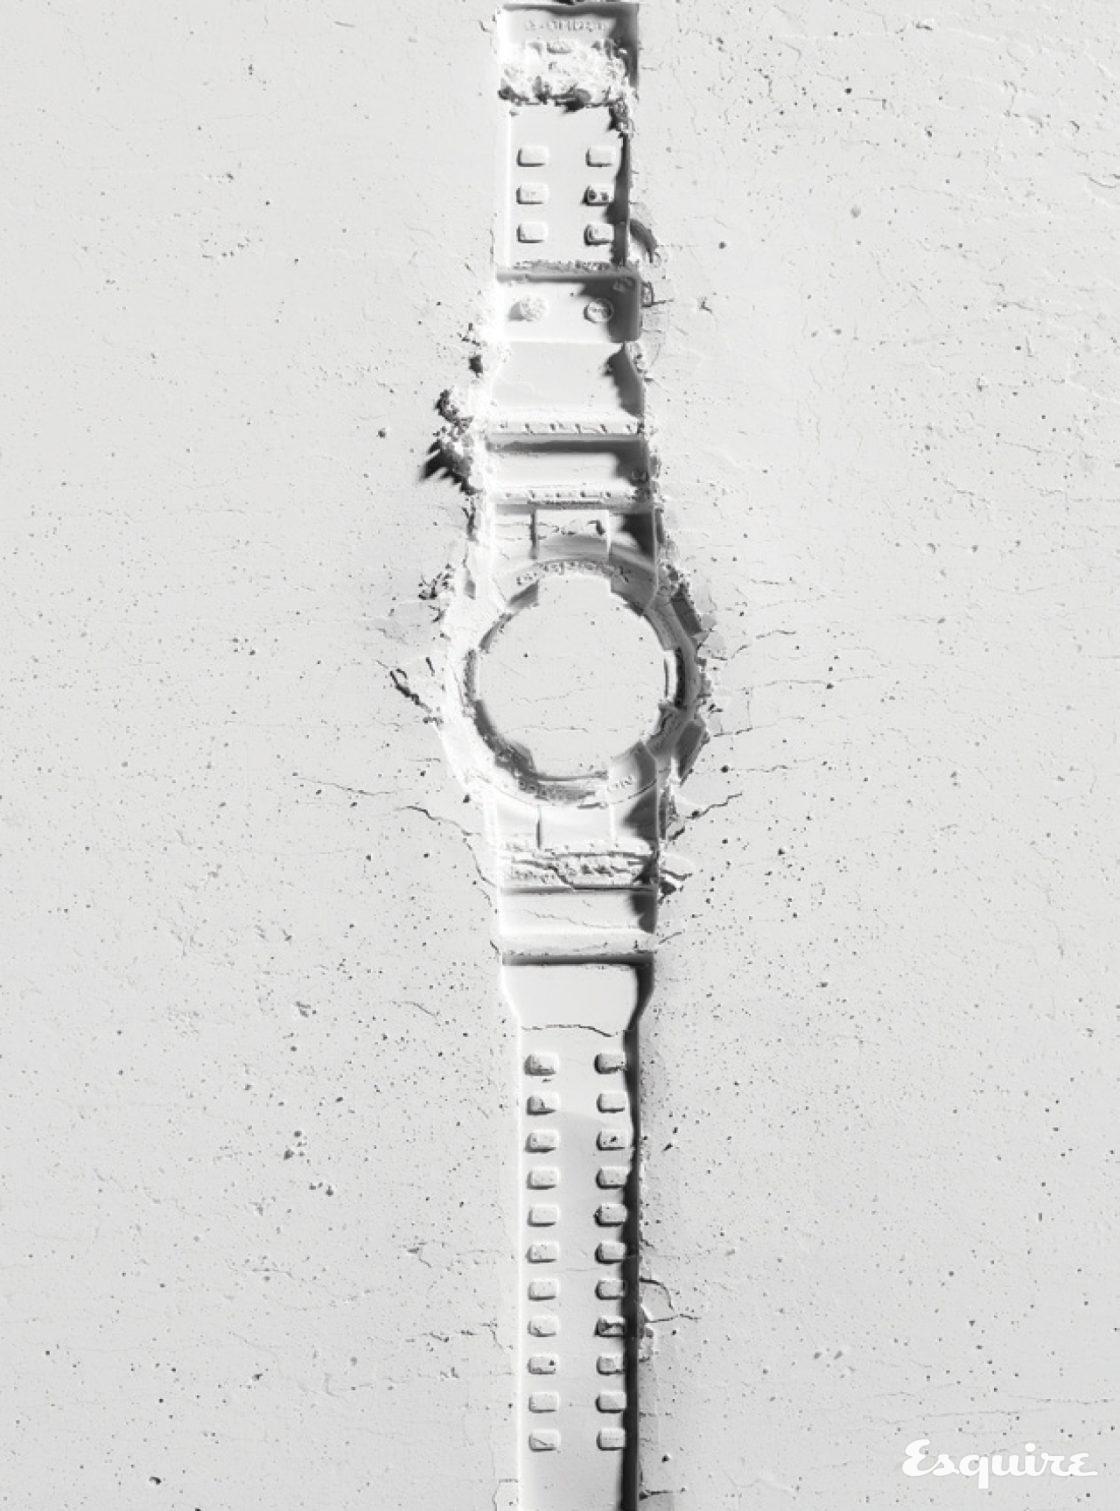 Snowy - 에스콰이어 Esquire Korea 2017년 1월호